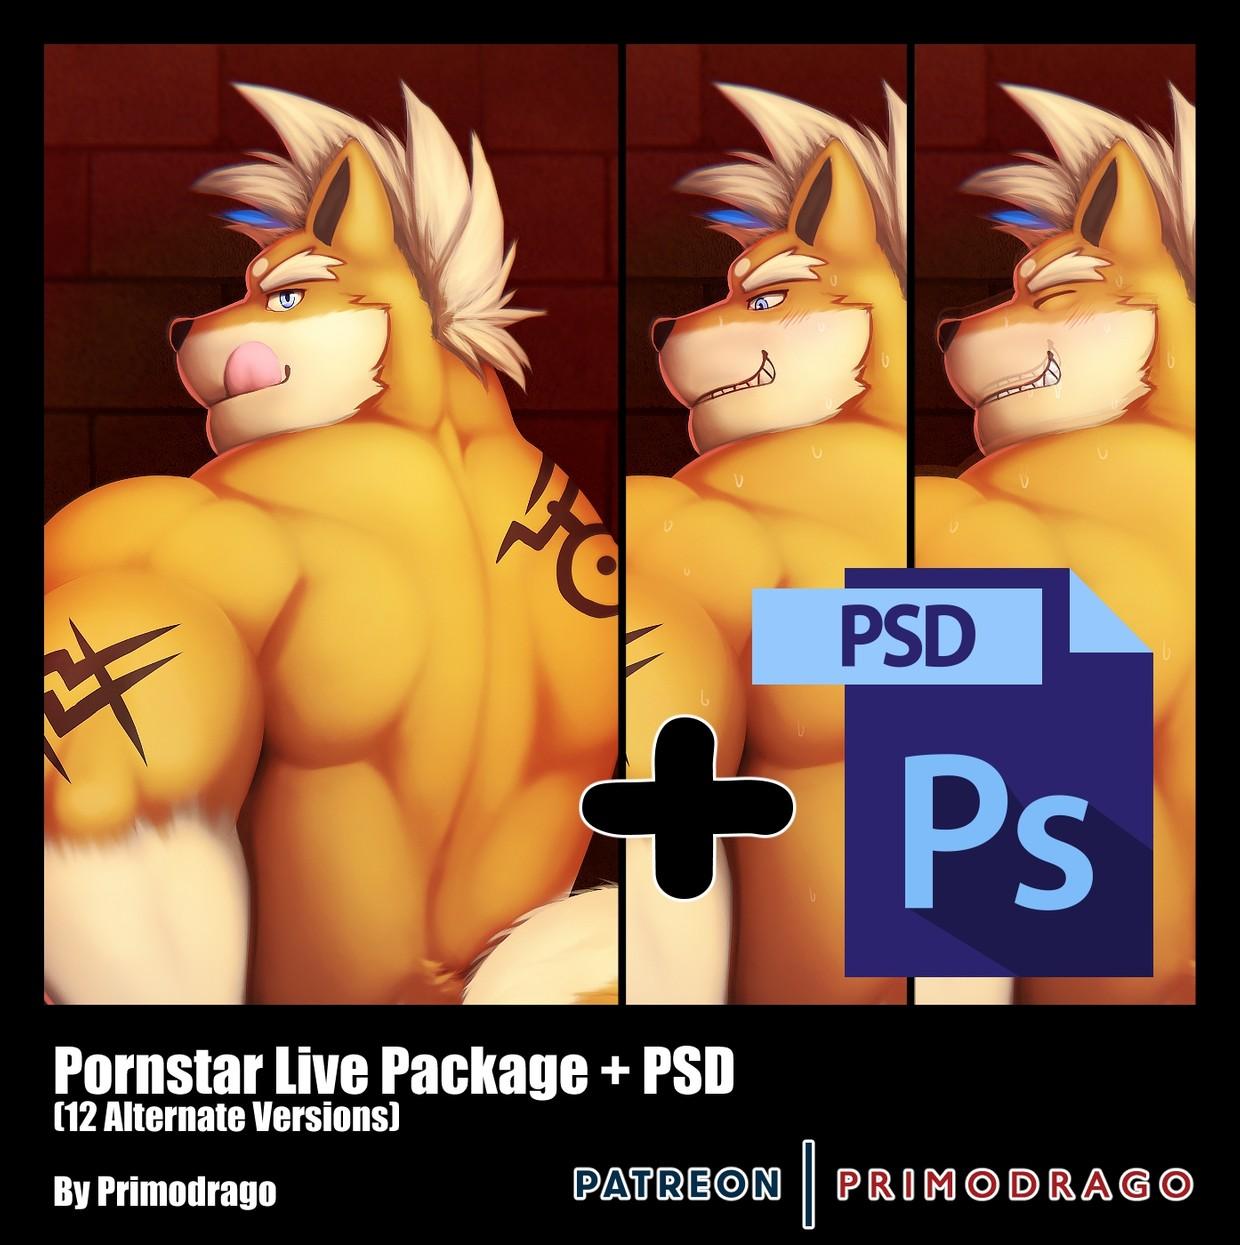 Pornstar Live Theme + PSD File